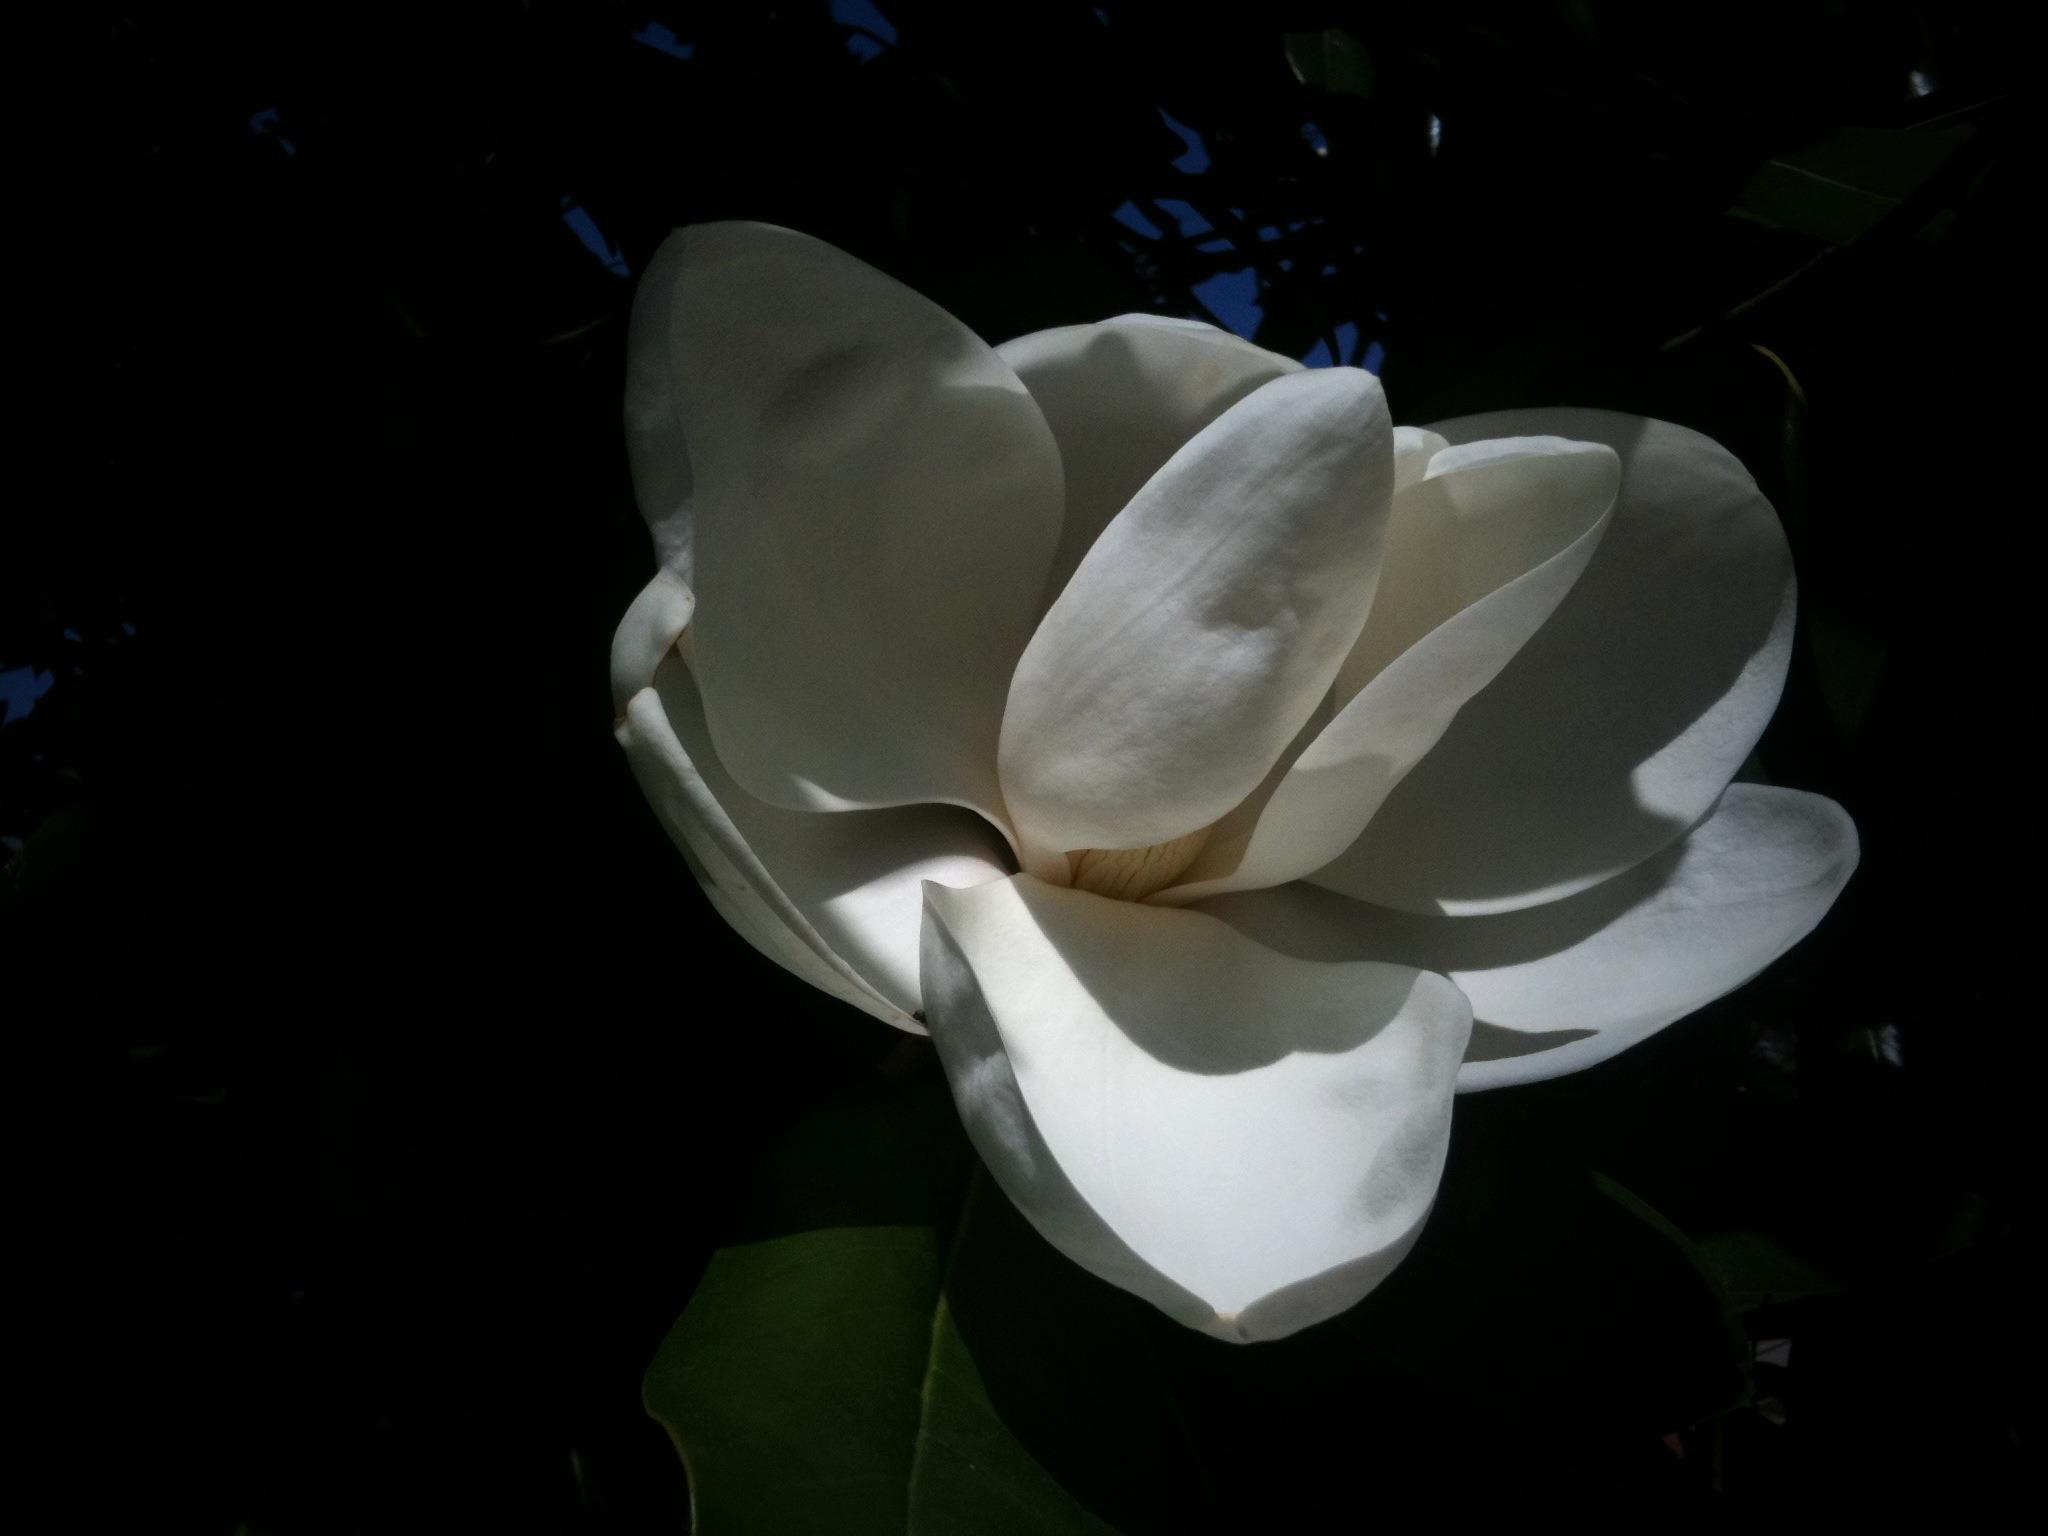 June bloom - Sweet magnolia on campus